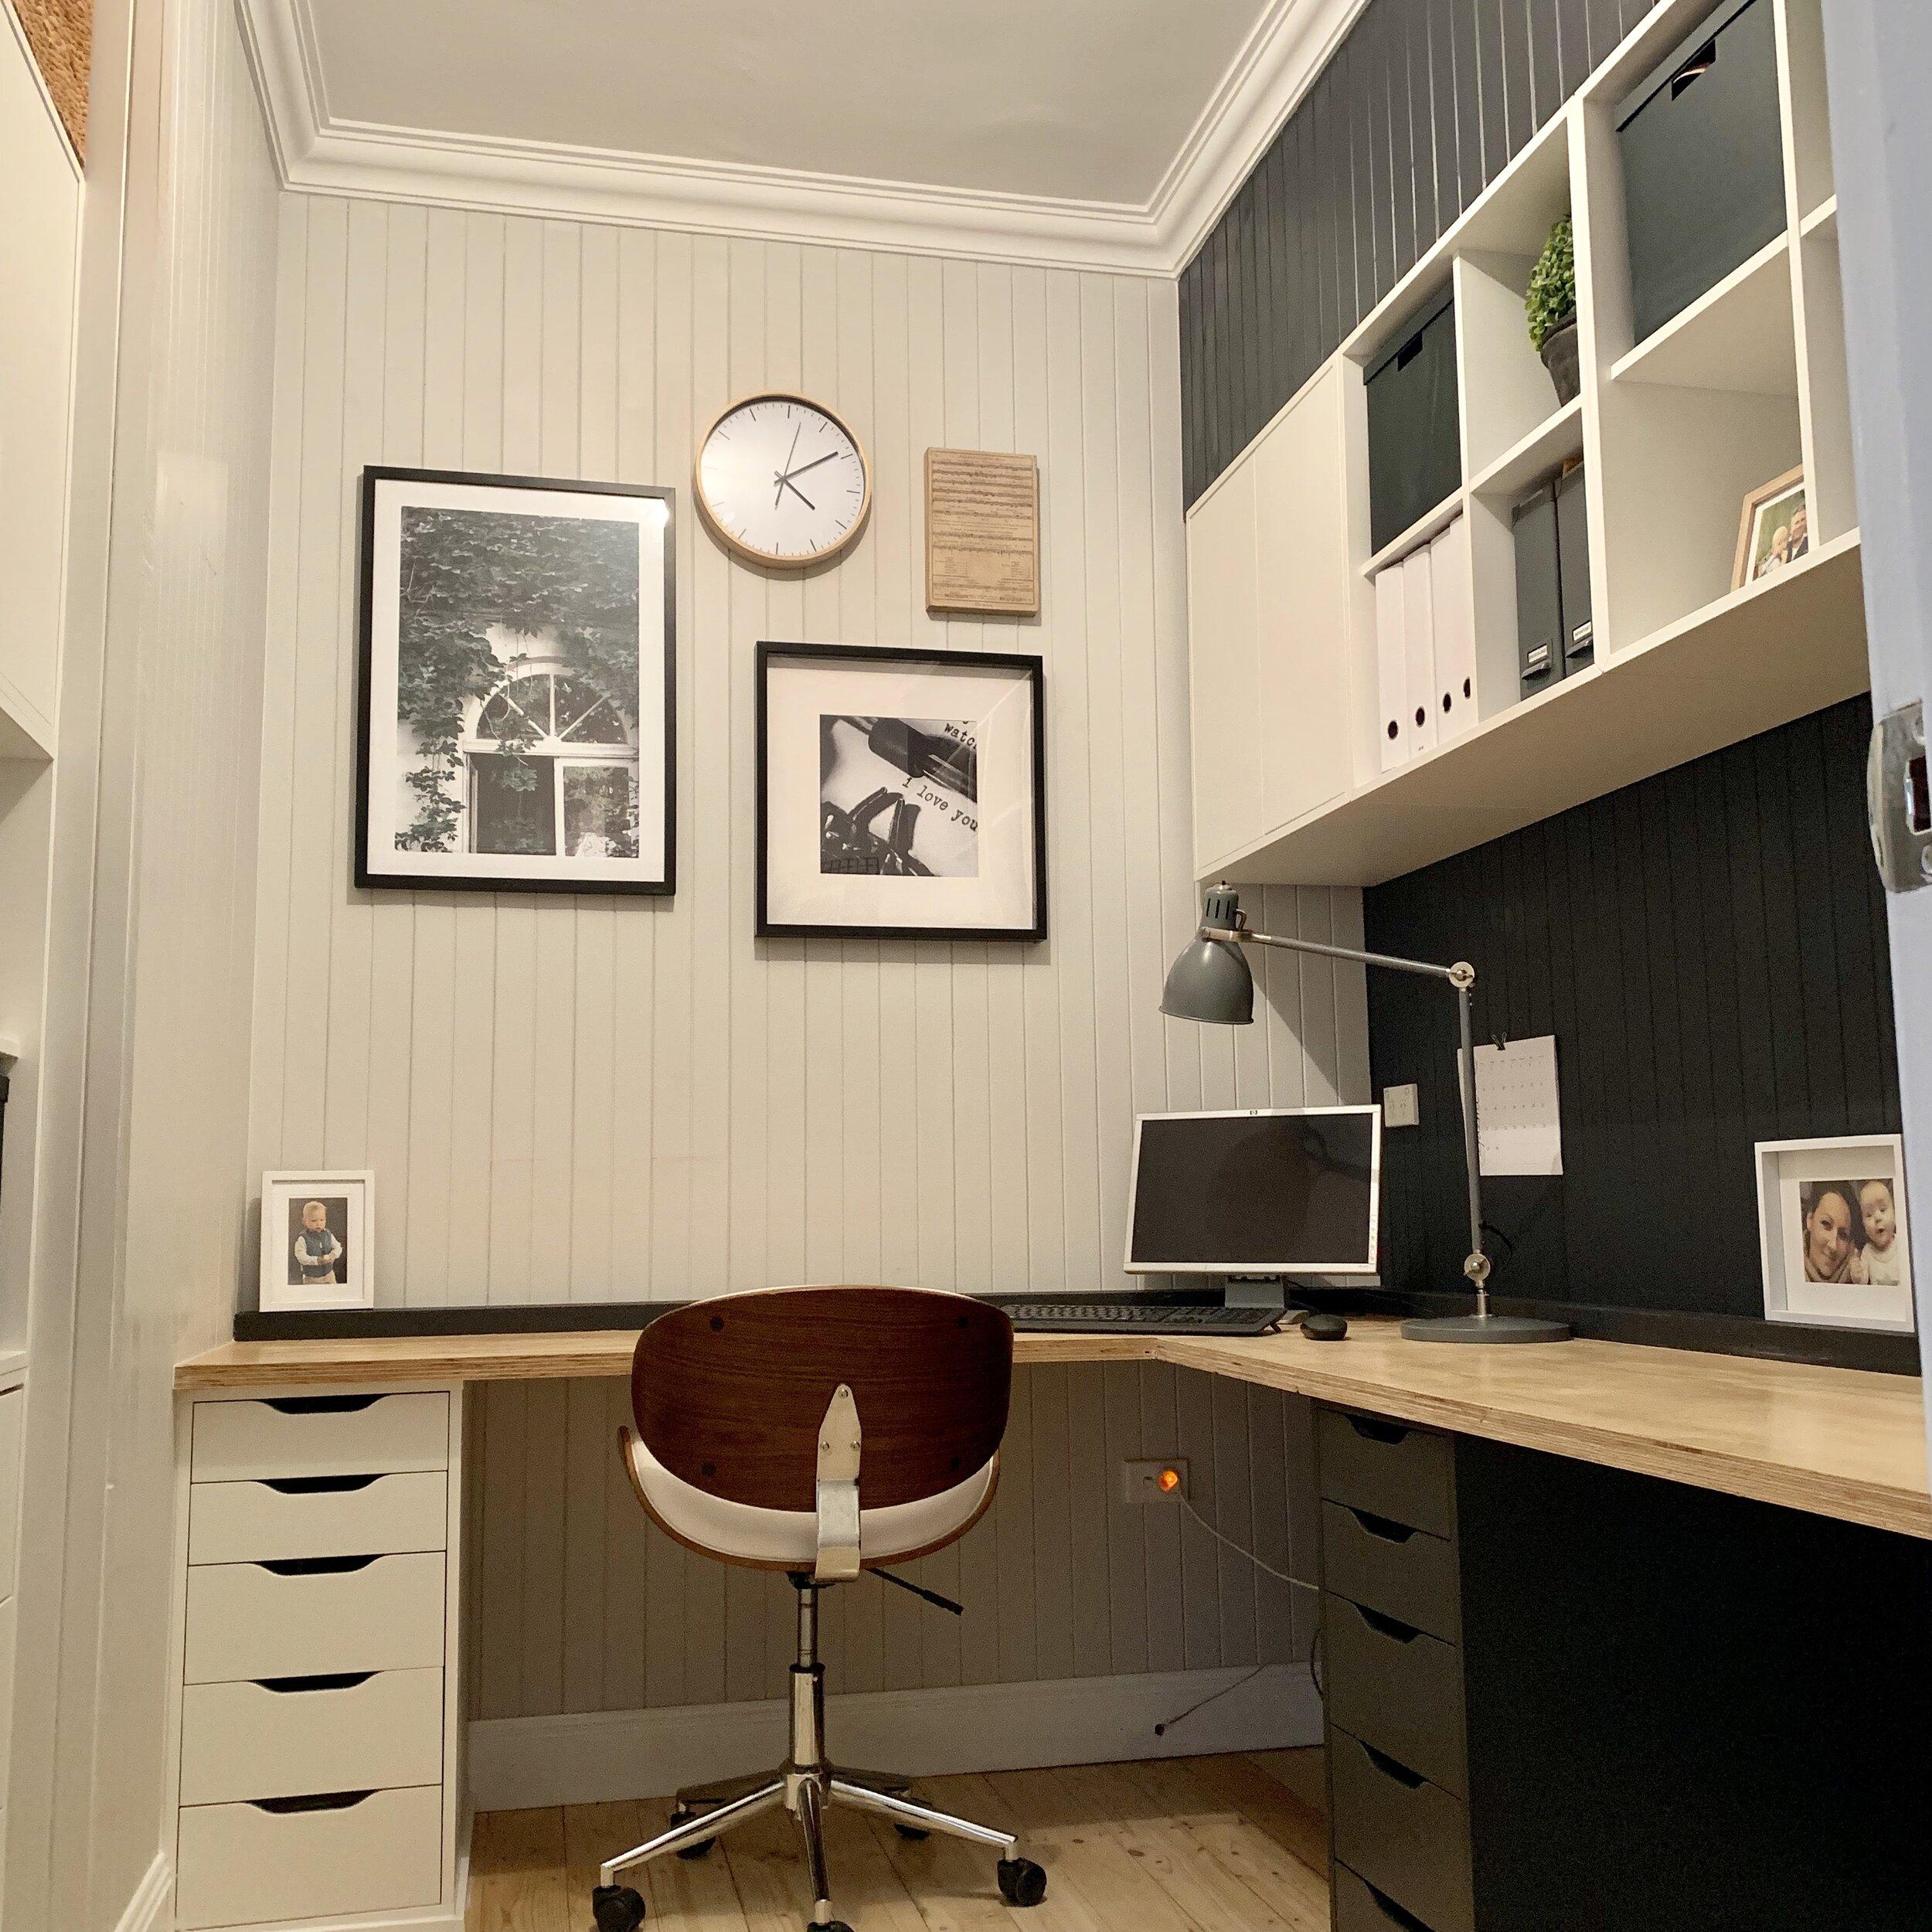 Design 2 Build - Warrnambool Interior Designer - Warrnambool Home Design 1.jpg